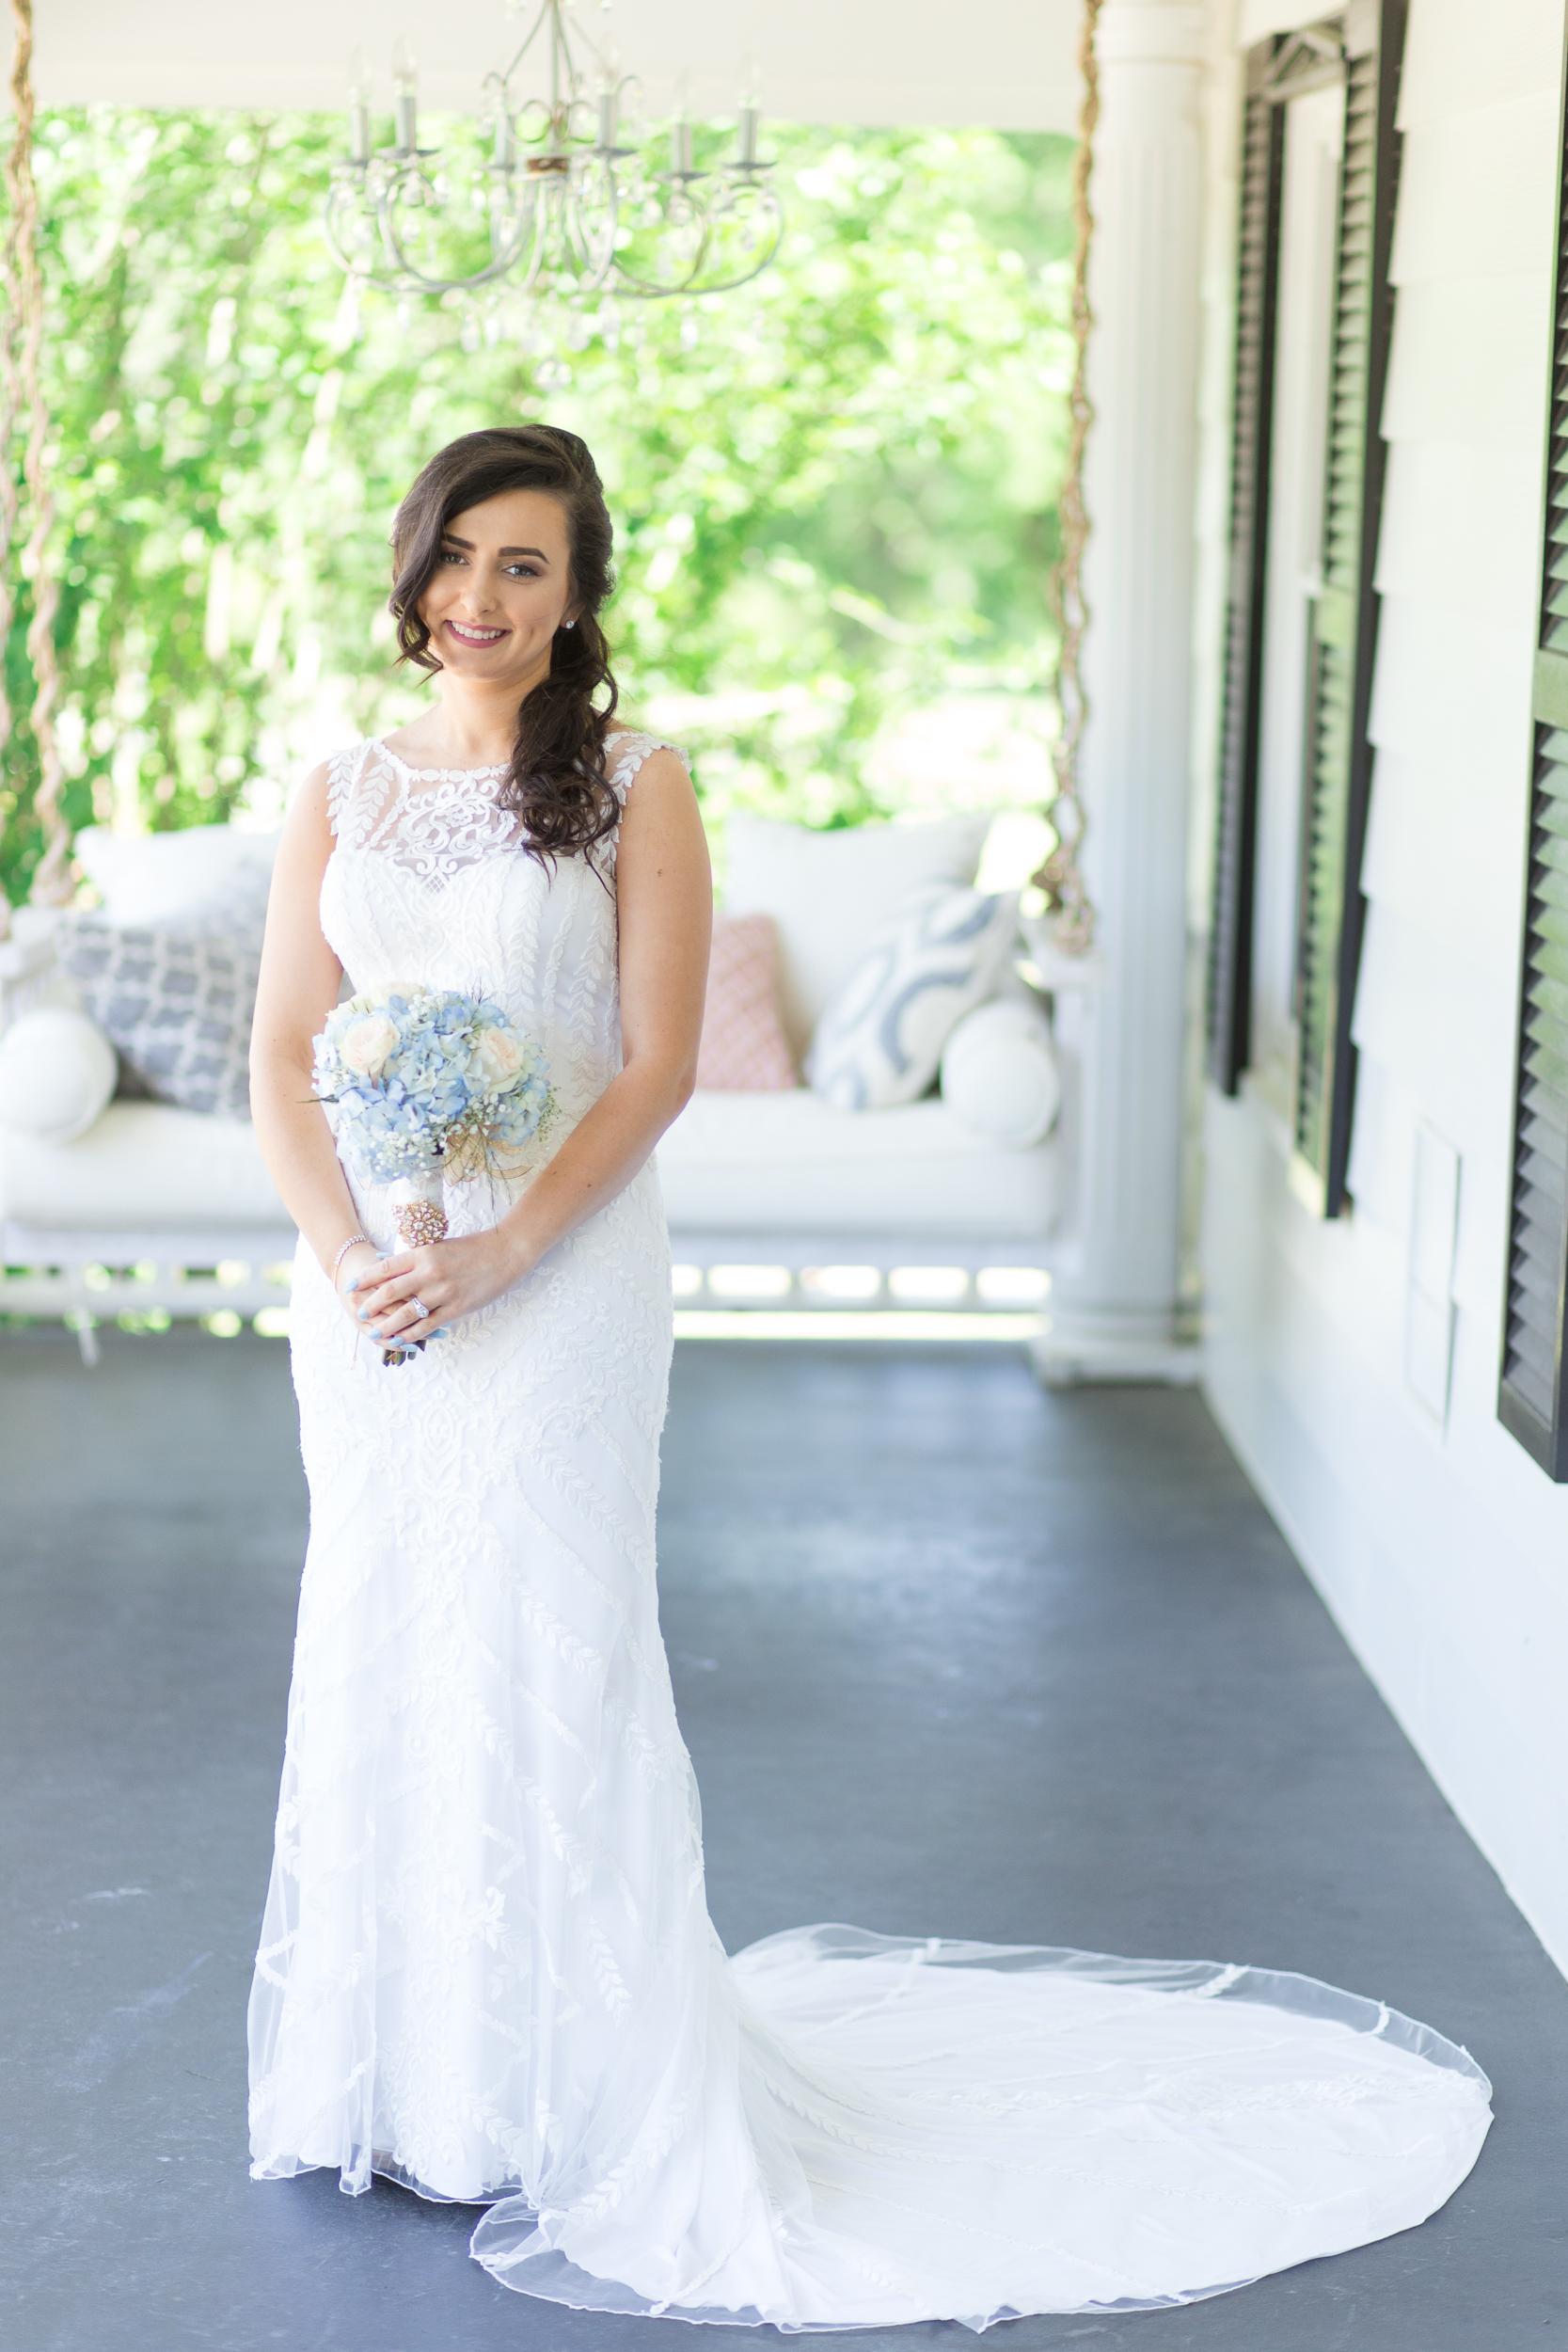 Zihlman-East TX Wedding_Kelsie Hendricks Photography_The Folmar Tyler Texas-69.jpg